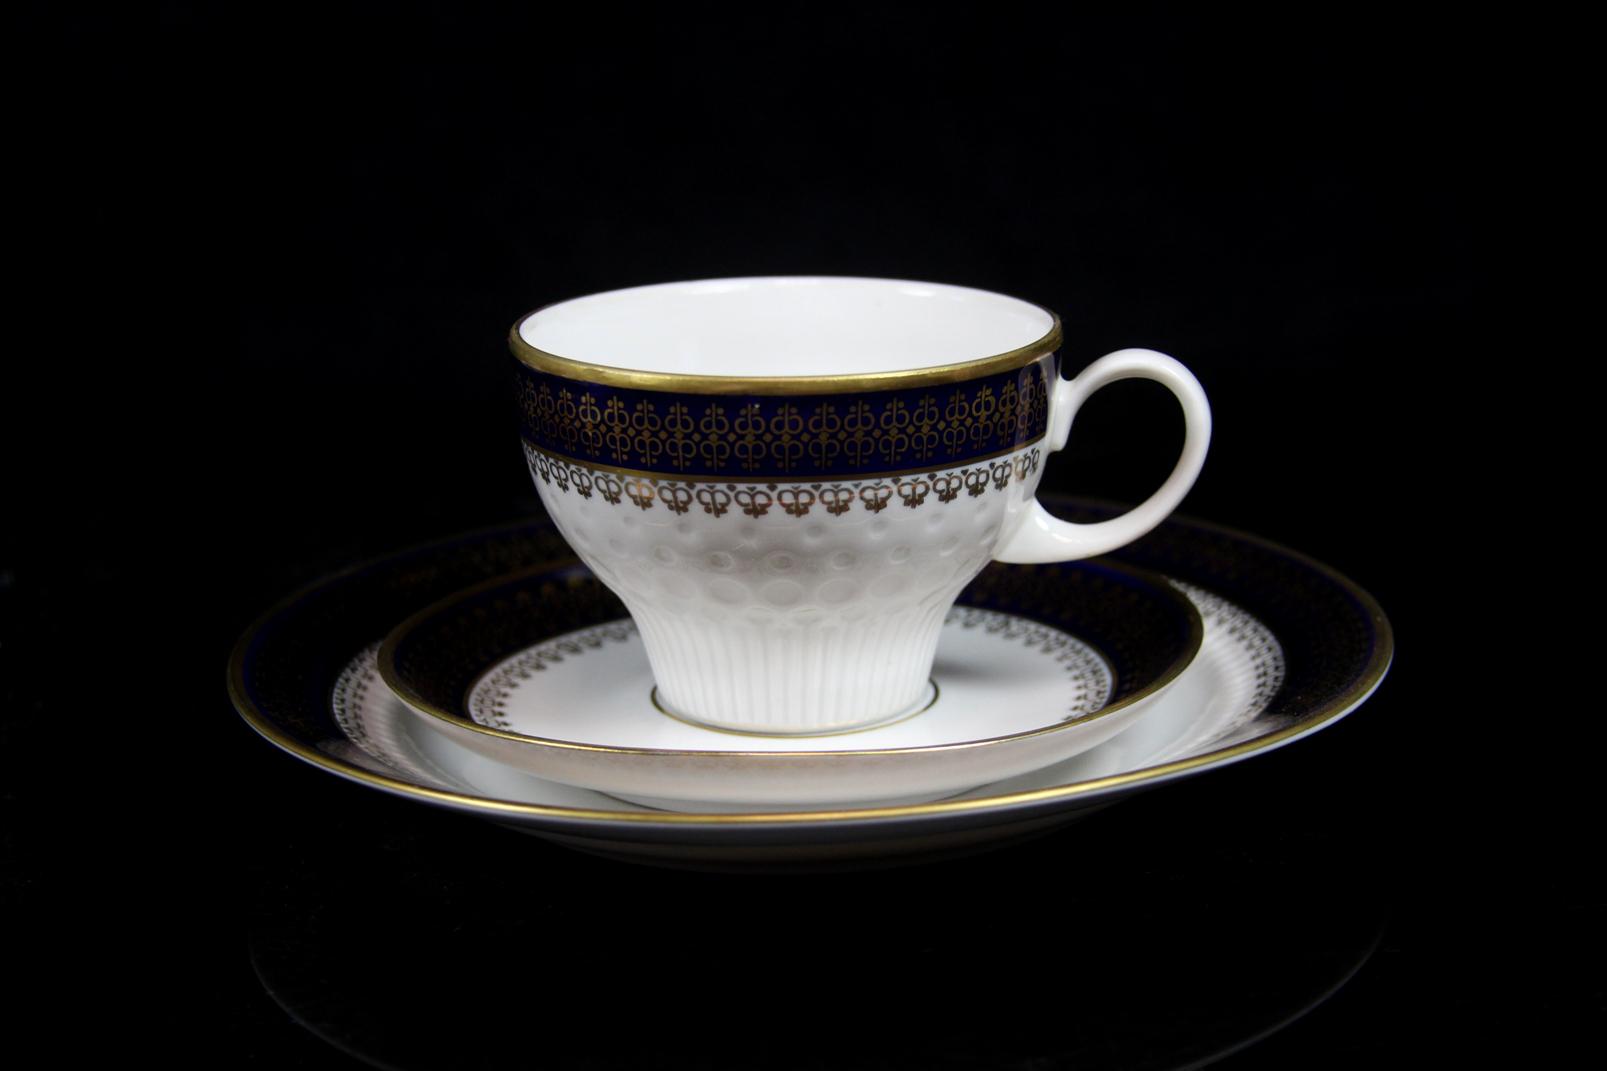 3 alte porzellan kaffeegedecke kahla echt kobalt 3 tlg kaffee sammelgedecke ebay. Black Bedroom Furniture Sets. Home Design Ideas